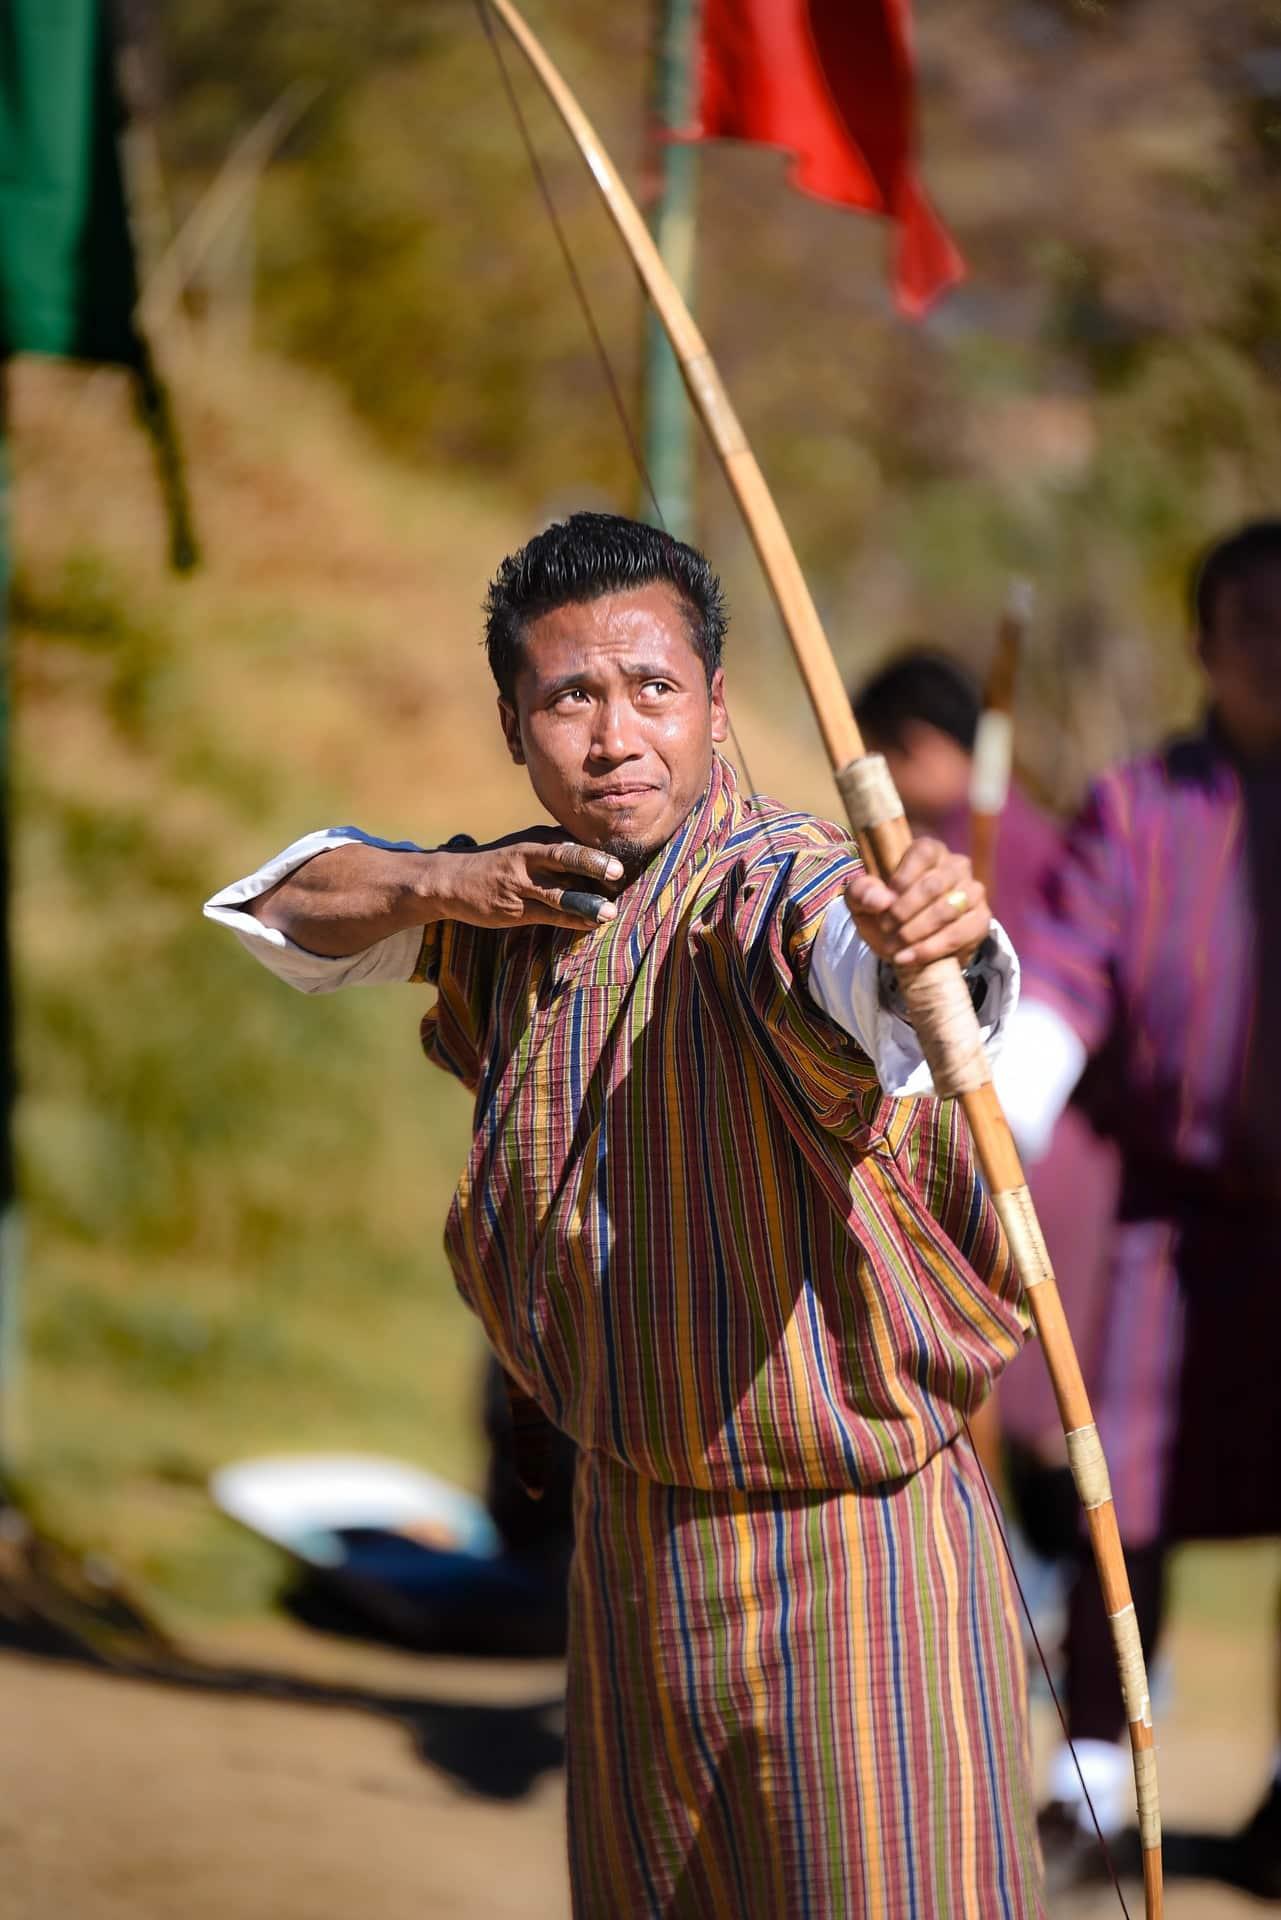 Man with an archer in Bhutan Archery adventure